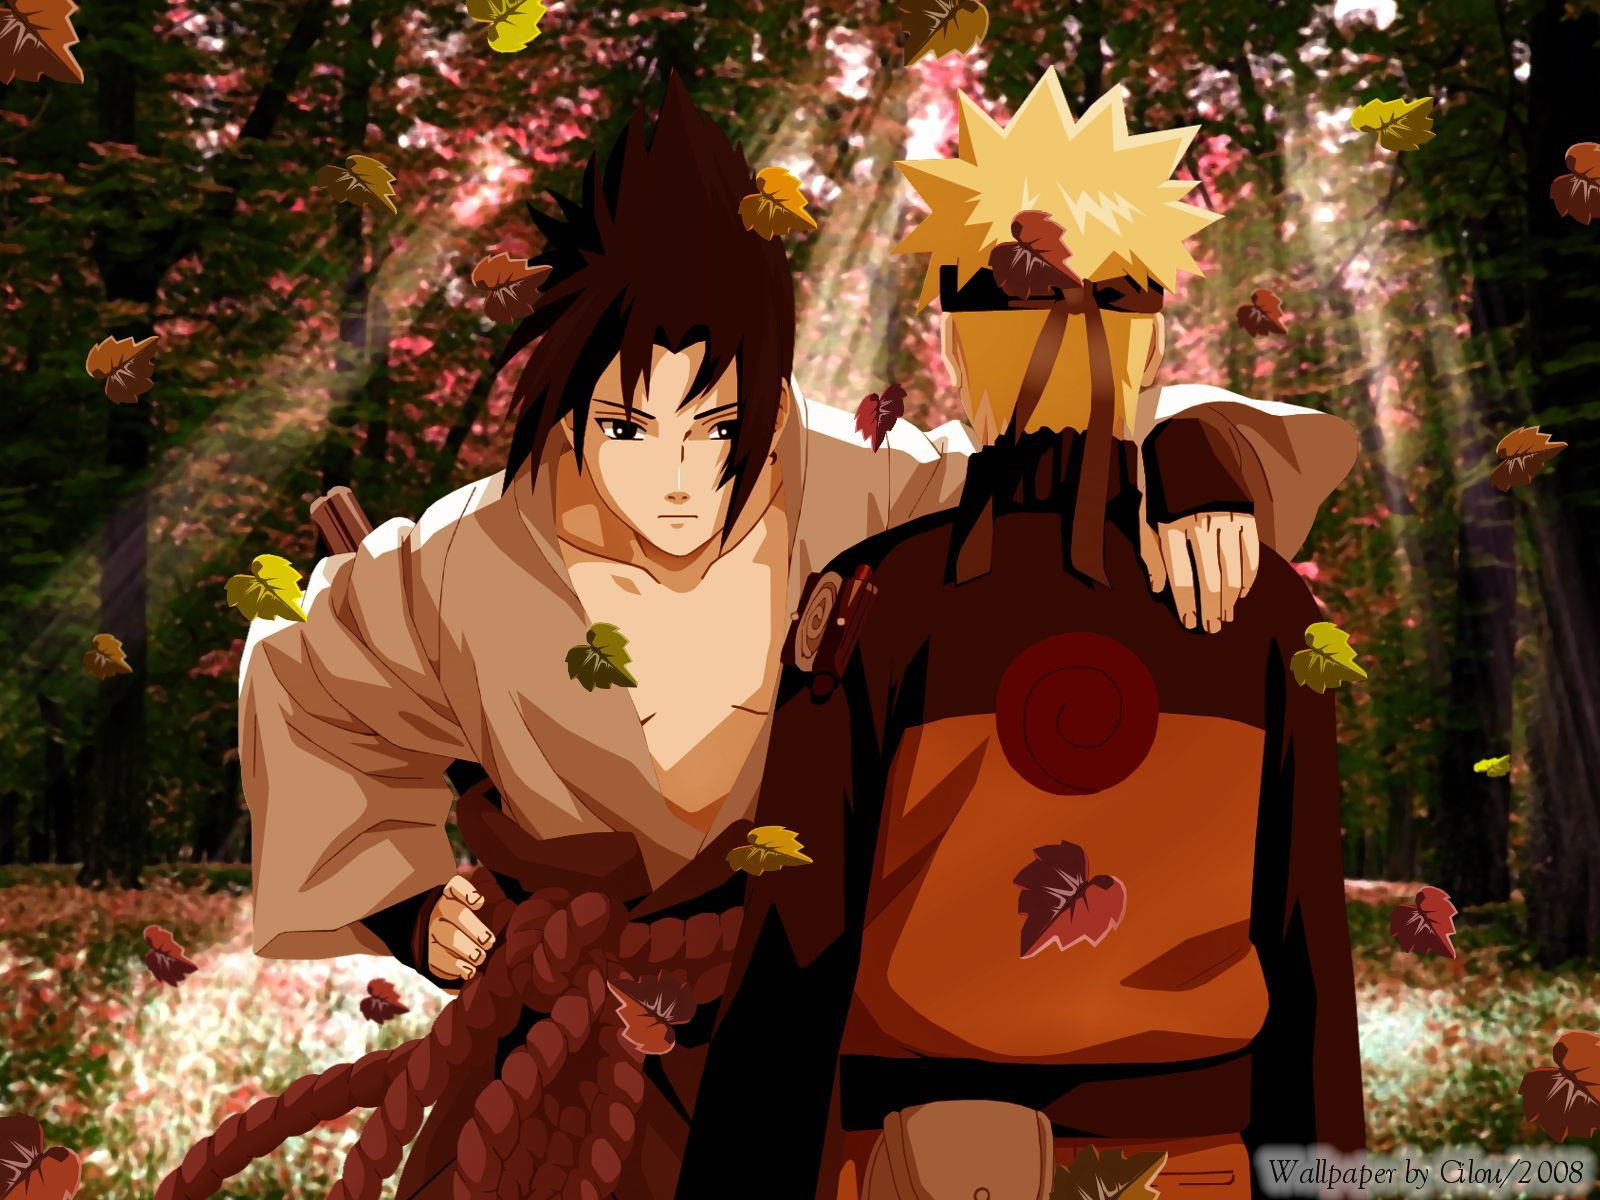 Wonderful Wallpaper Naruto Good - ea22ad61afb5d02469e59d3eb1ef8bb4  Perfect Image Reference_548517.jpg